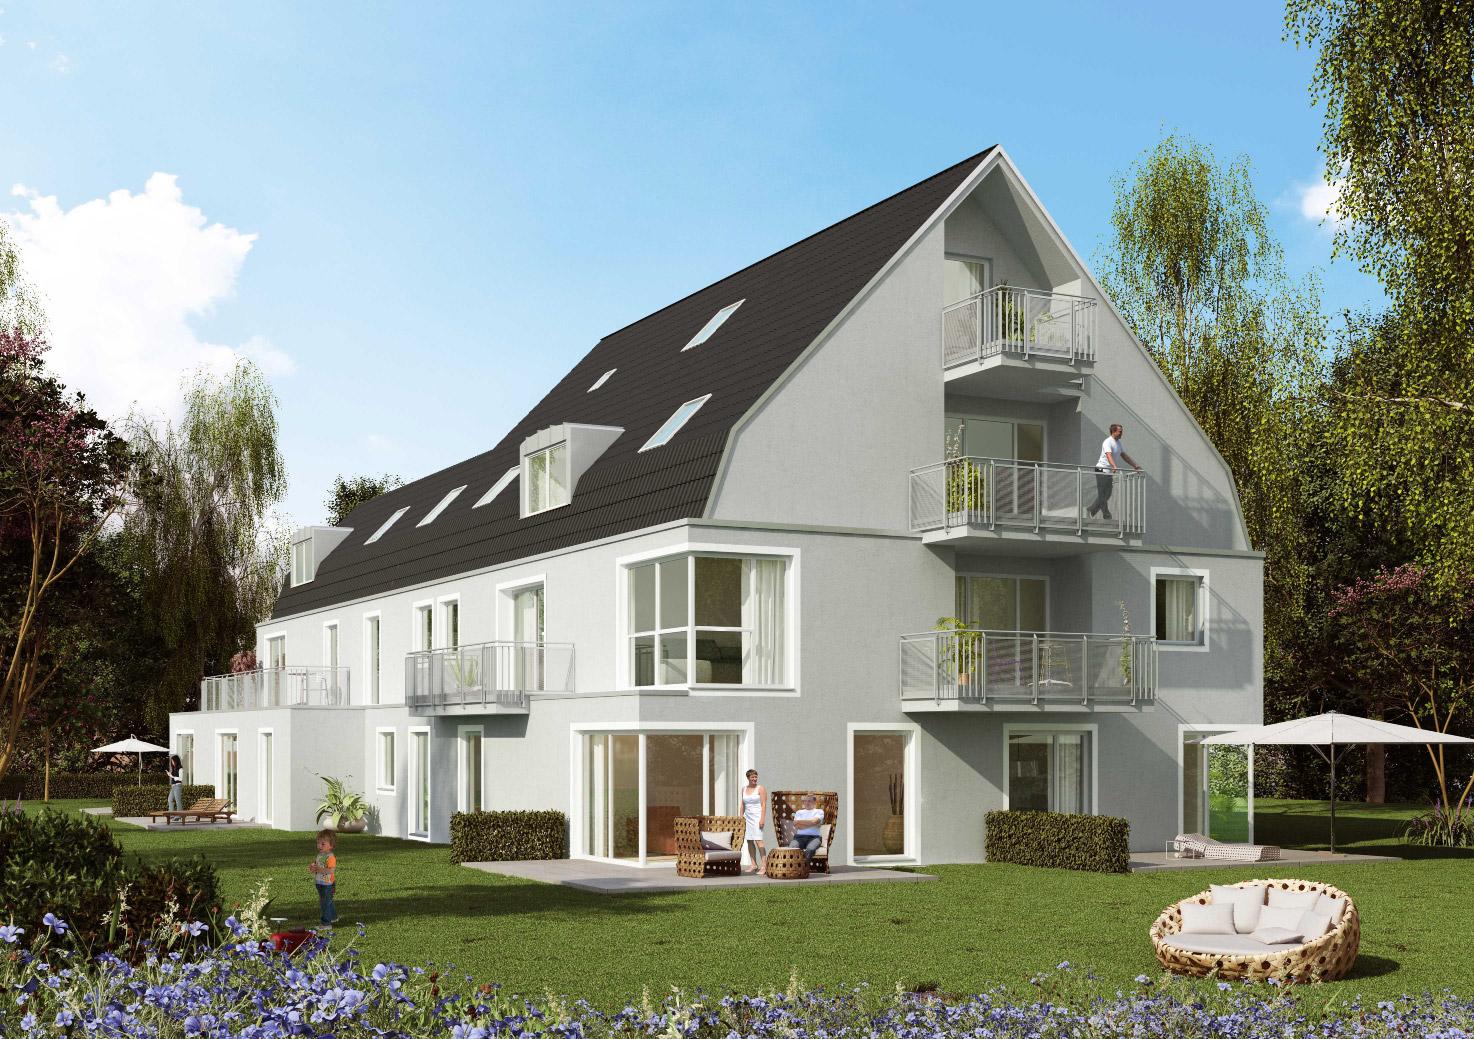 mehrfamilienhaus mit tiefgarage m nchen forstenried. Black Bedroom Furniture Sets. Home Design Ideas